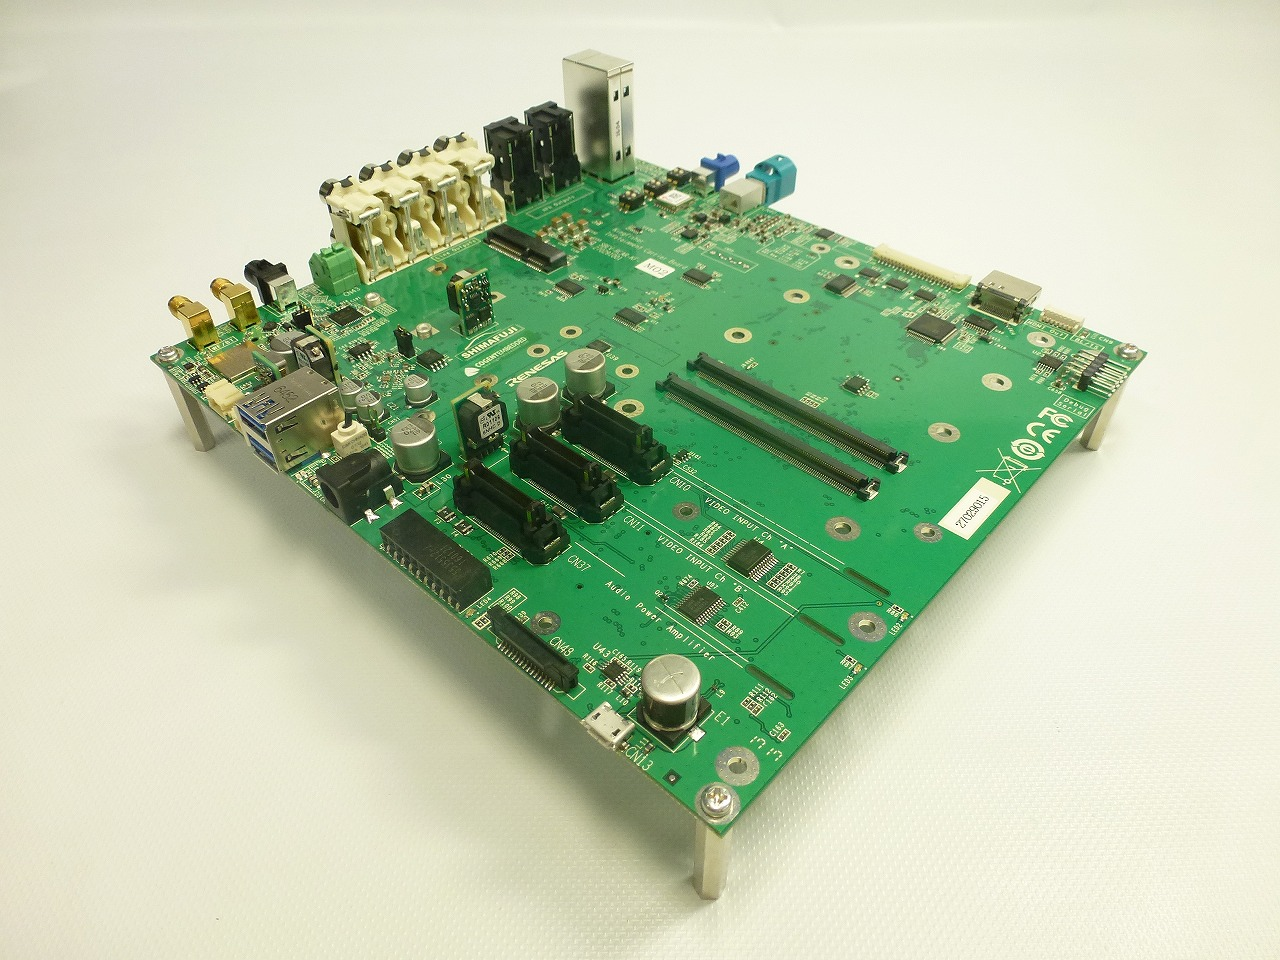 SBEV-RCAR-KF-M02 (Advanced Model)